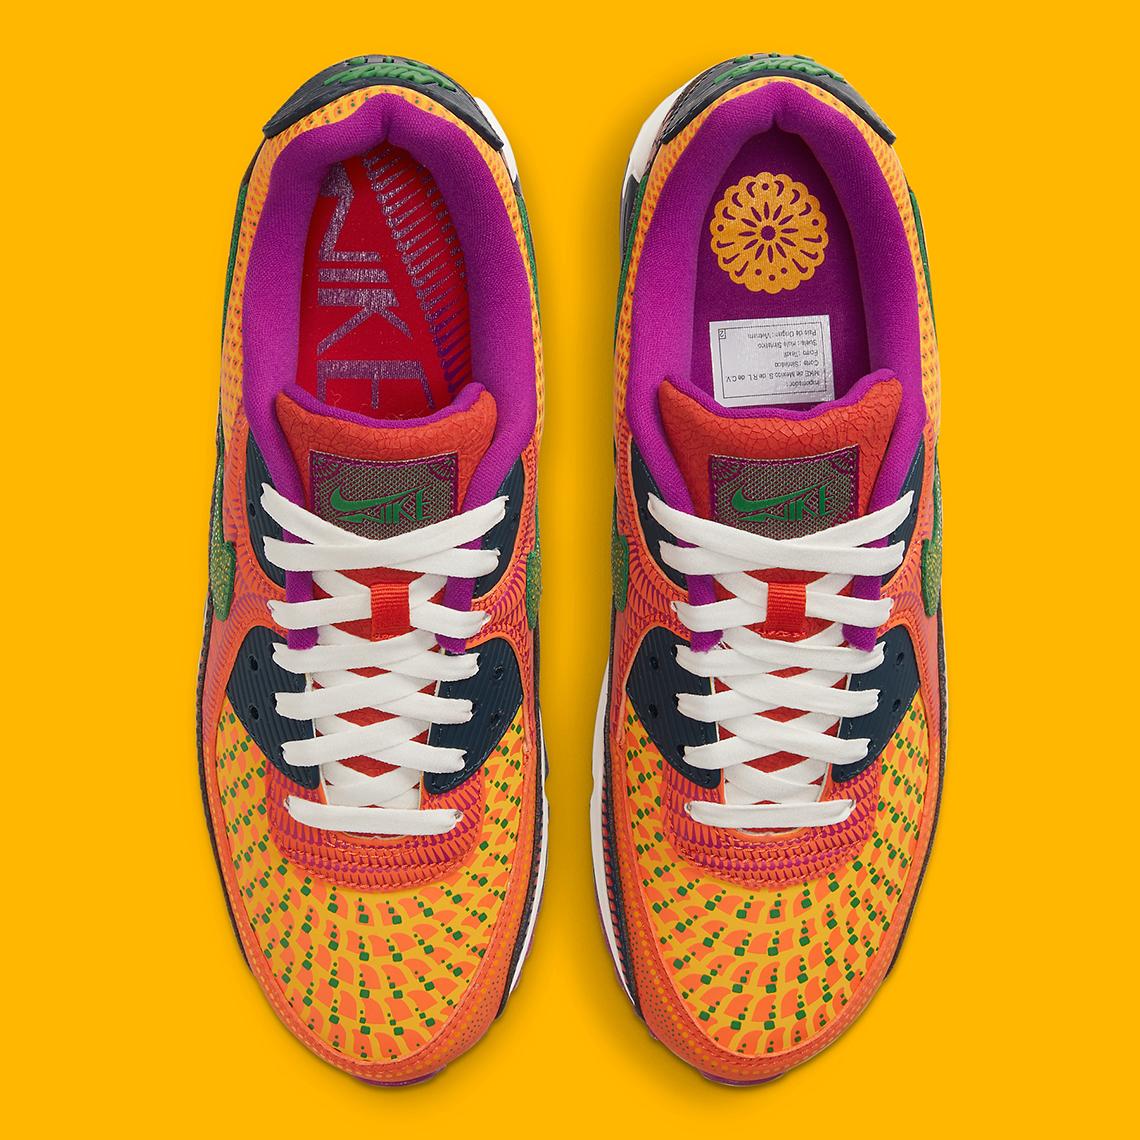 daño proteína Mediador  Nike Air Max 90 Dia de Los Muertos DC5154-458 | SneakerNews.com